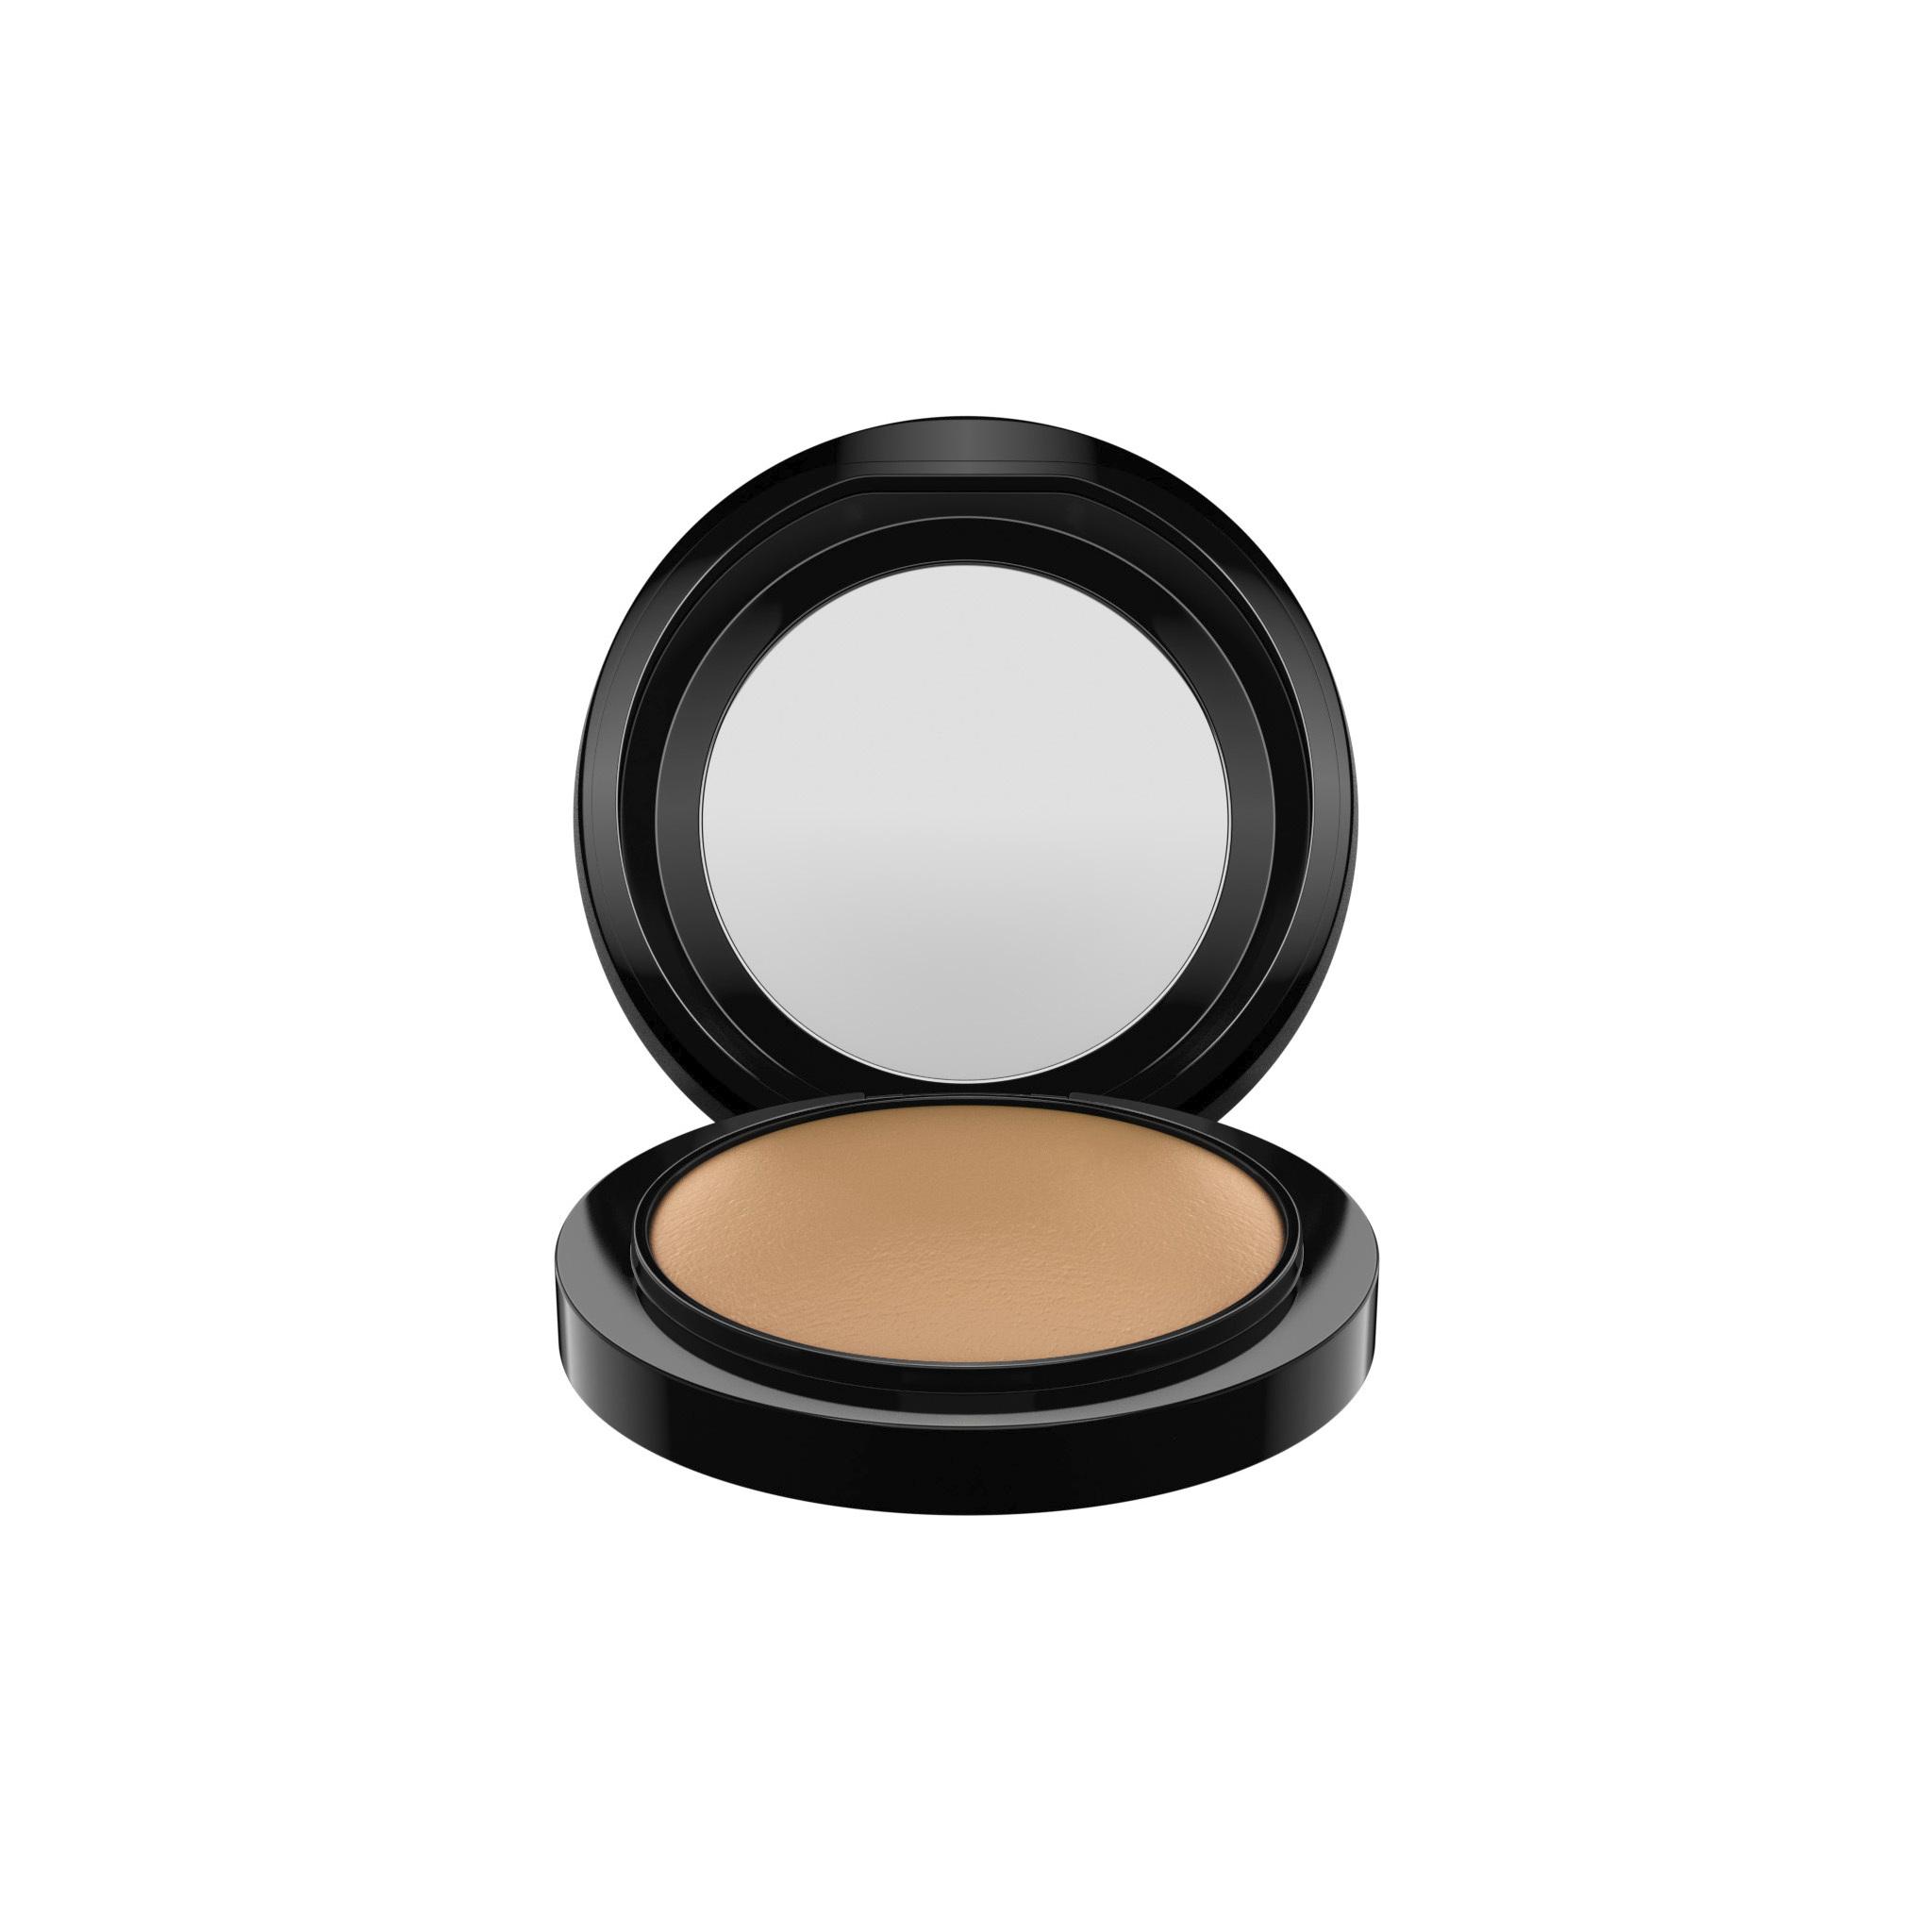 MAC Mineralize Skinfinish/Natural, dark